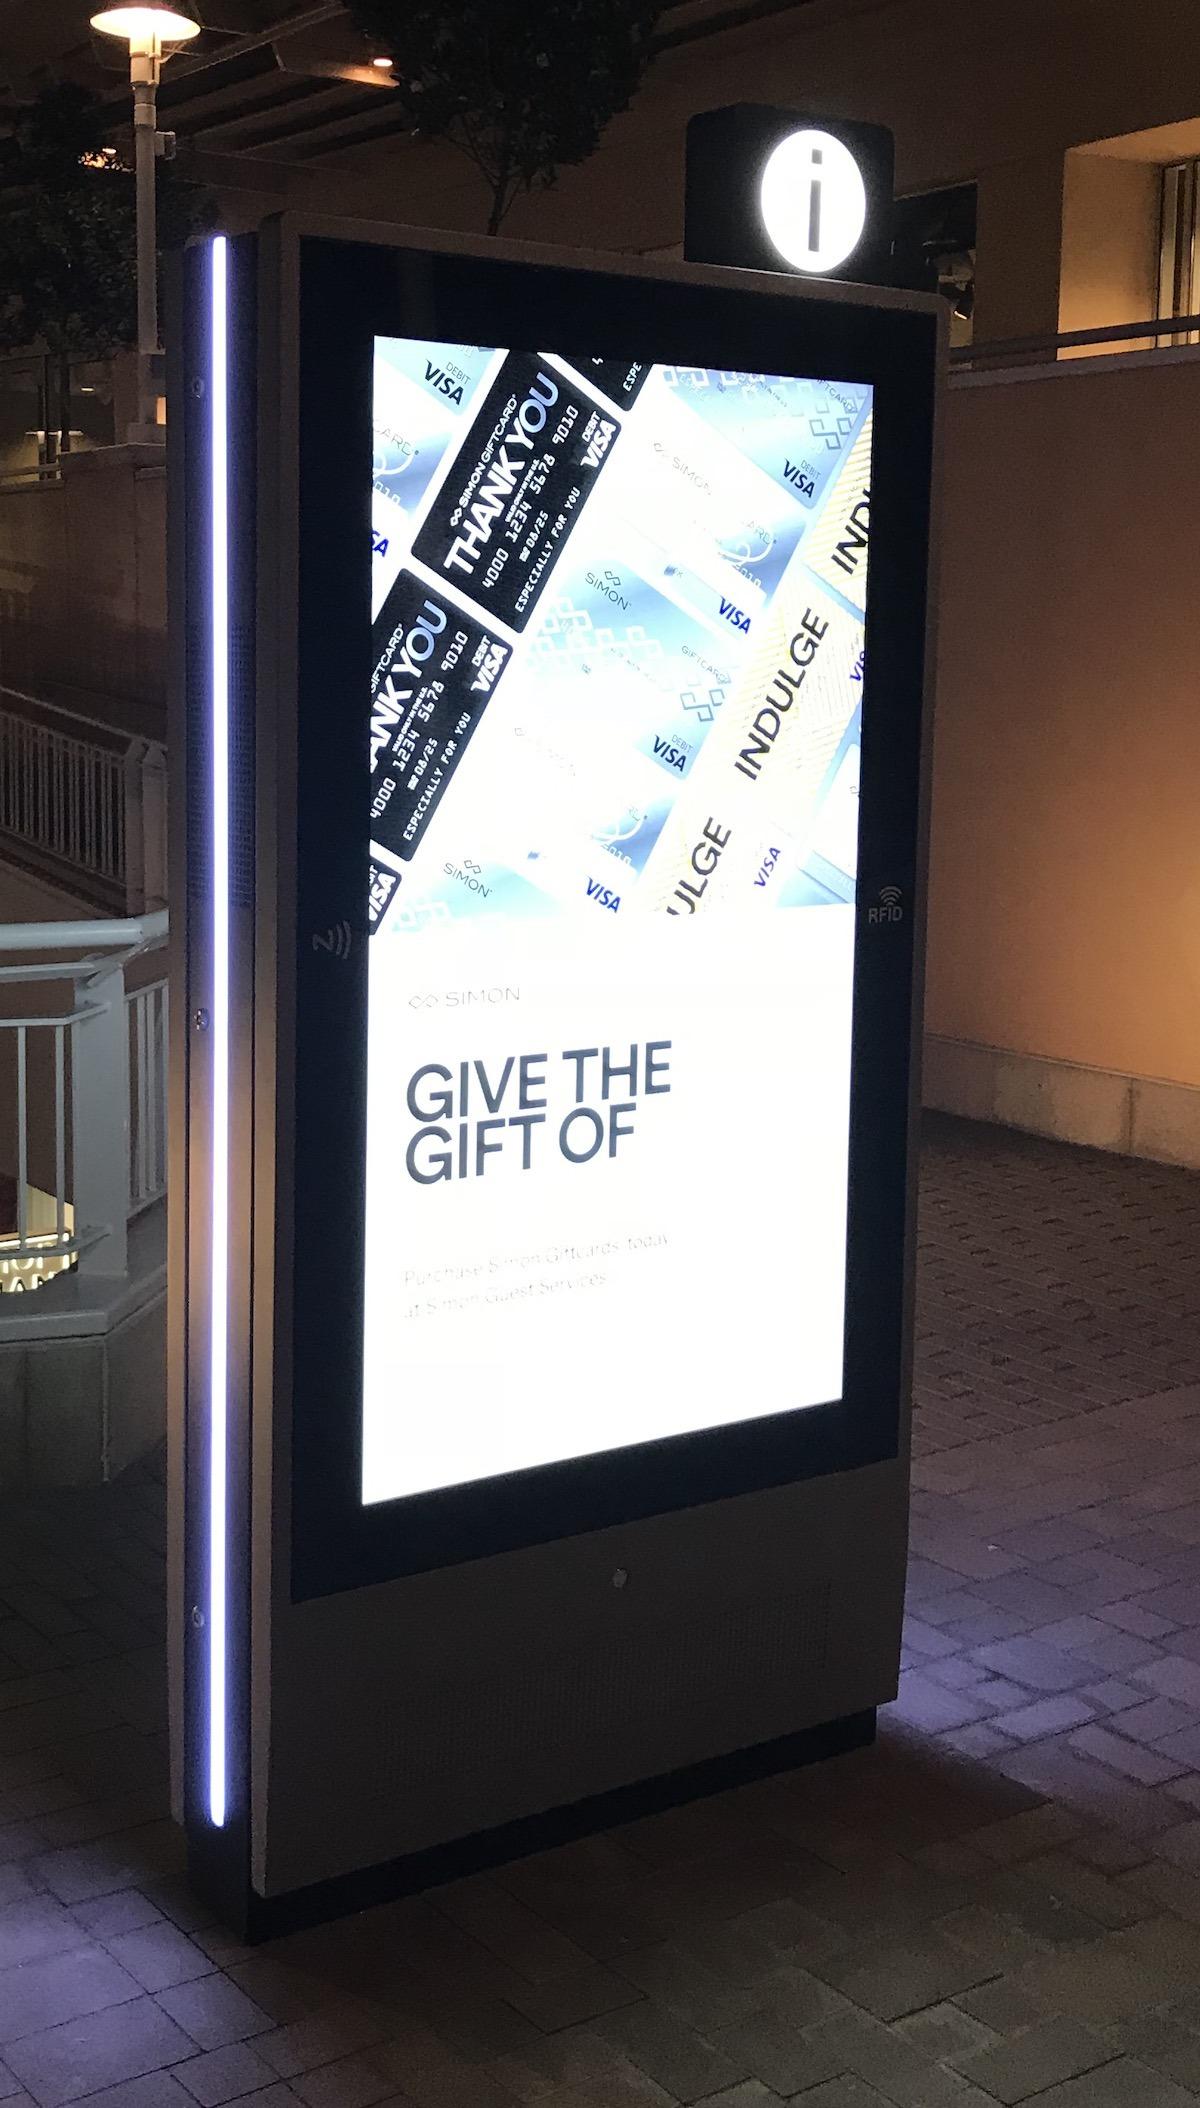 Fashion Valley Mall Digital Displays